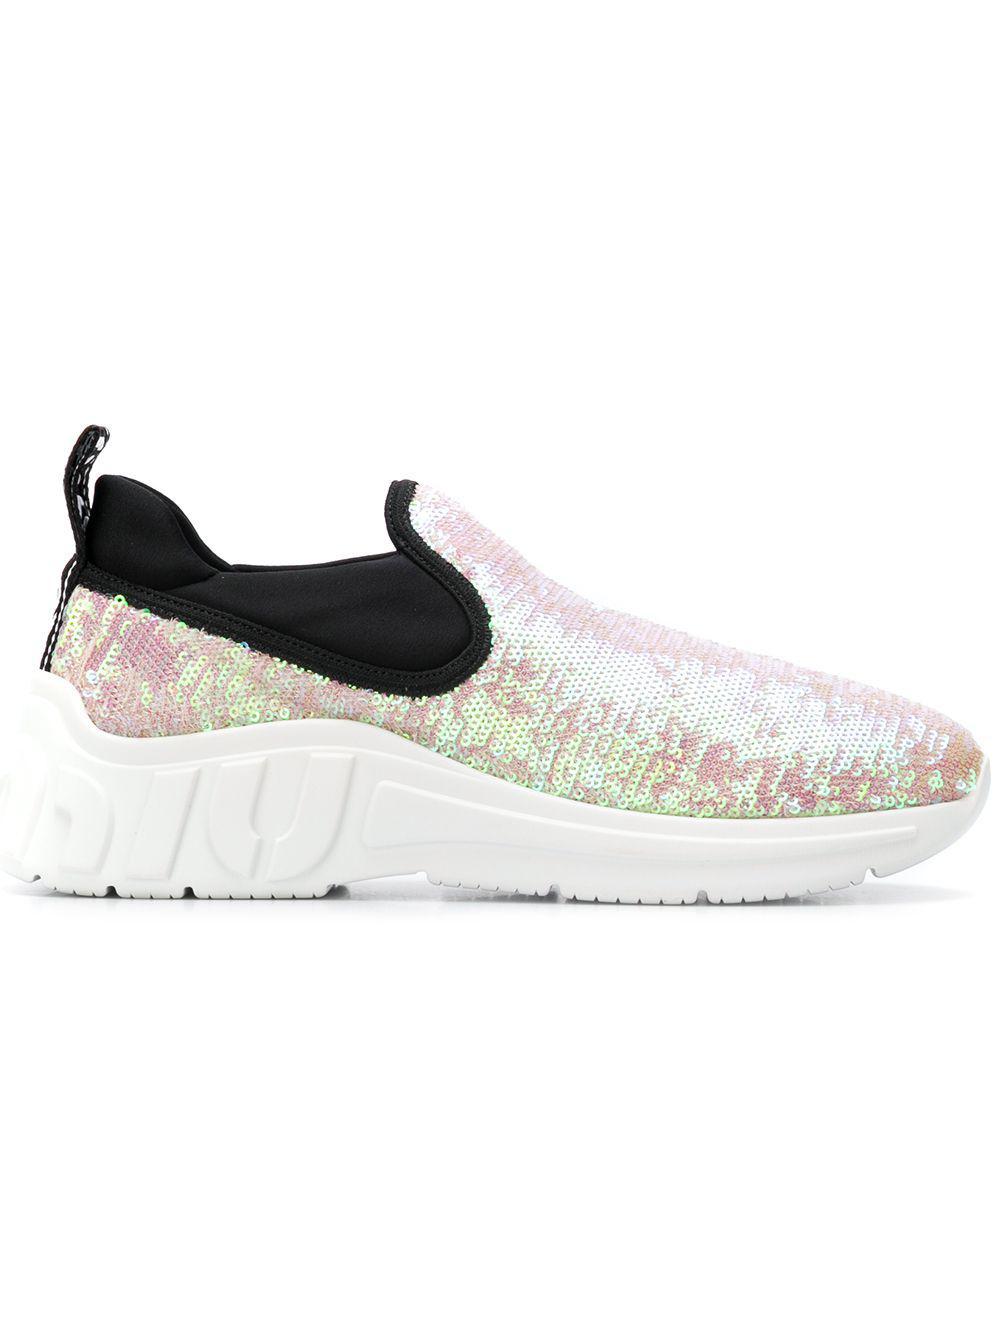 Miu Miu Cotton Slip-on Sequin Trainers